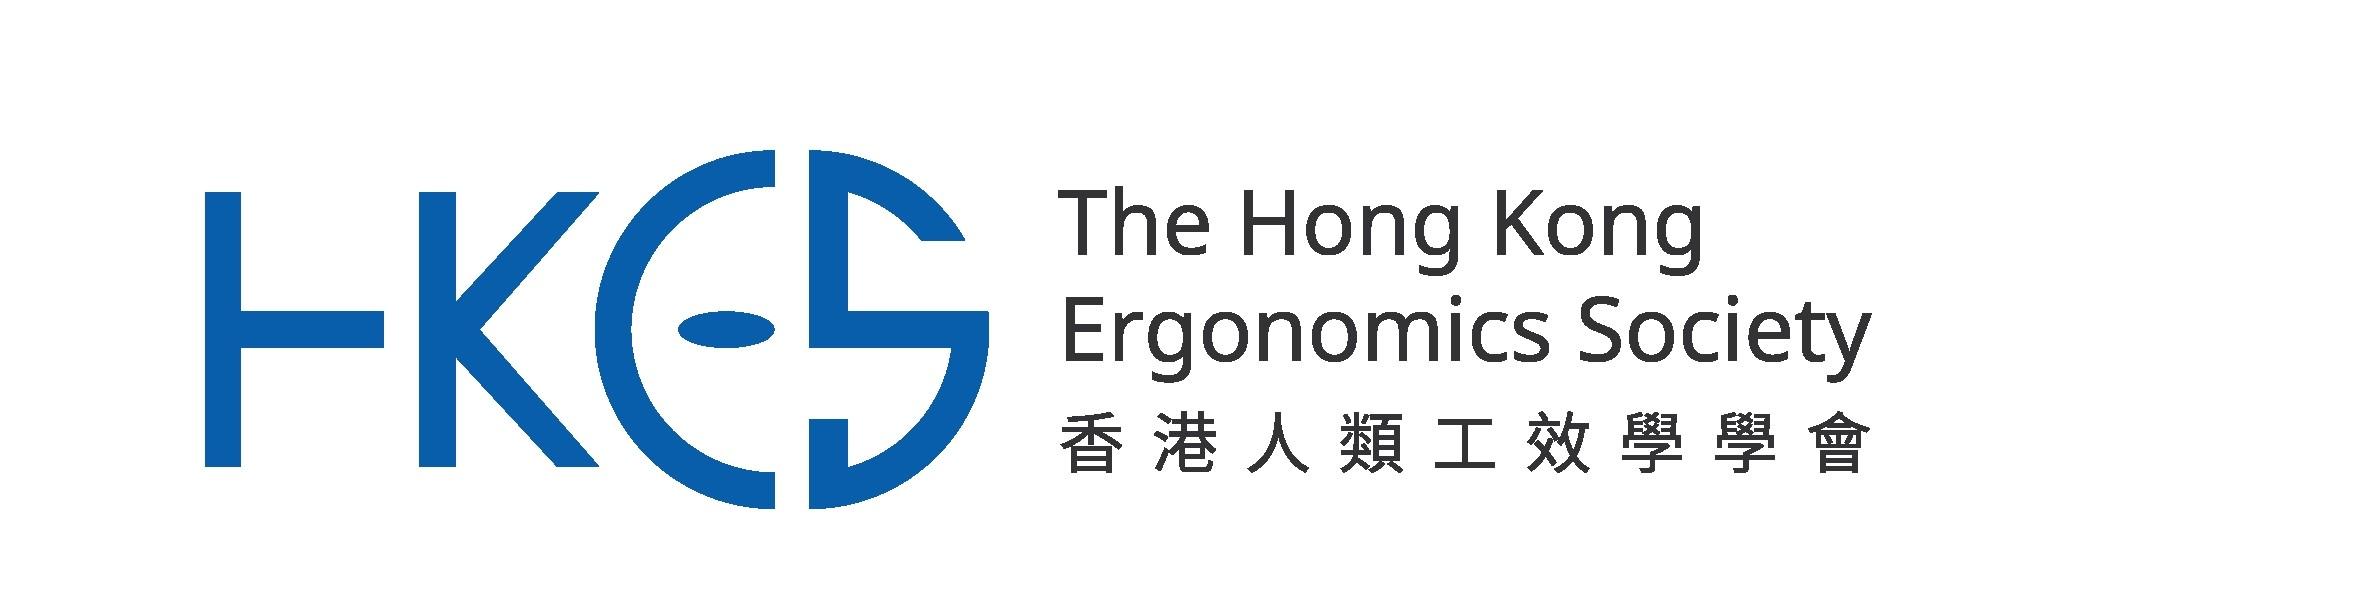 2019AEC_HongKongLogo